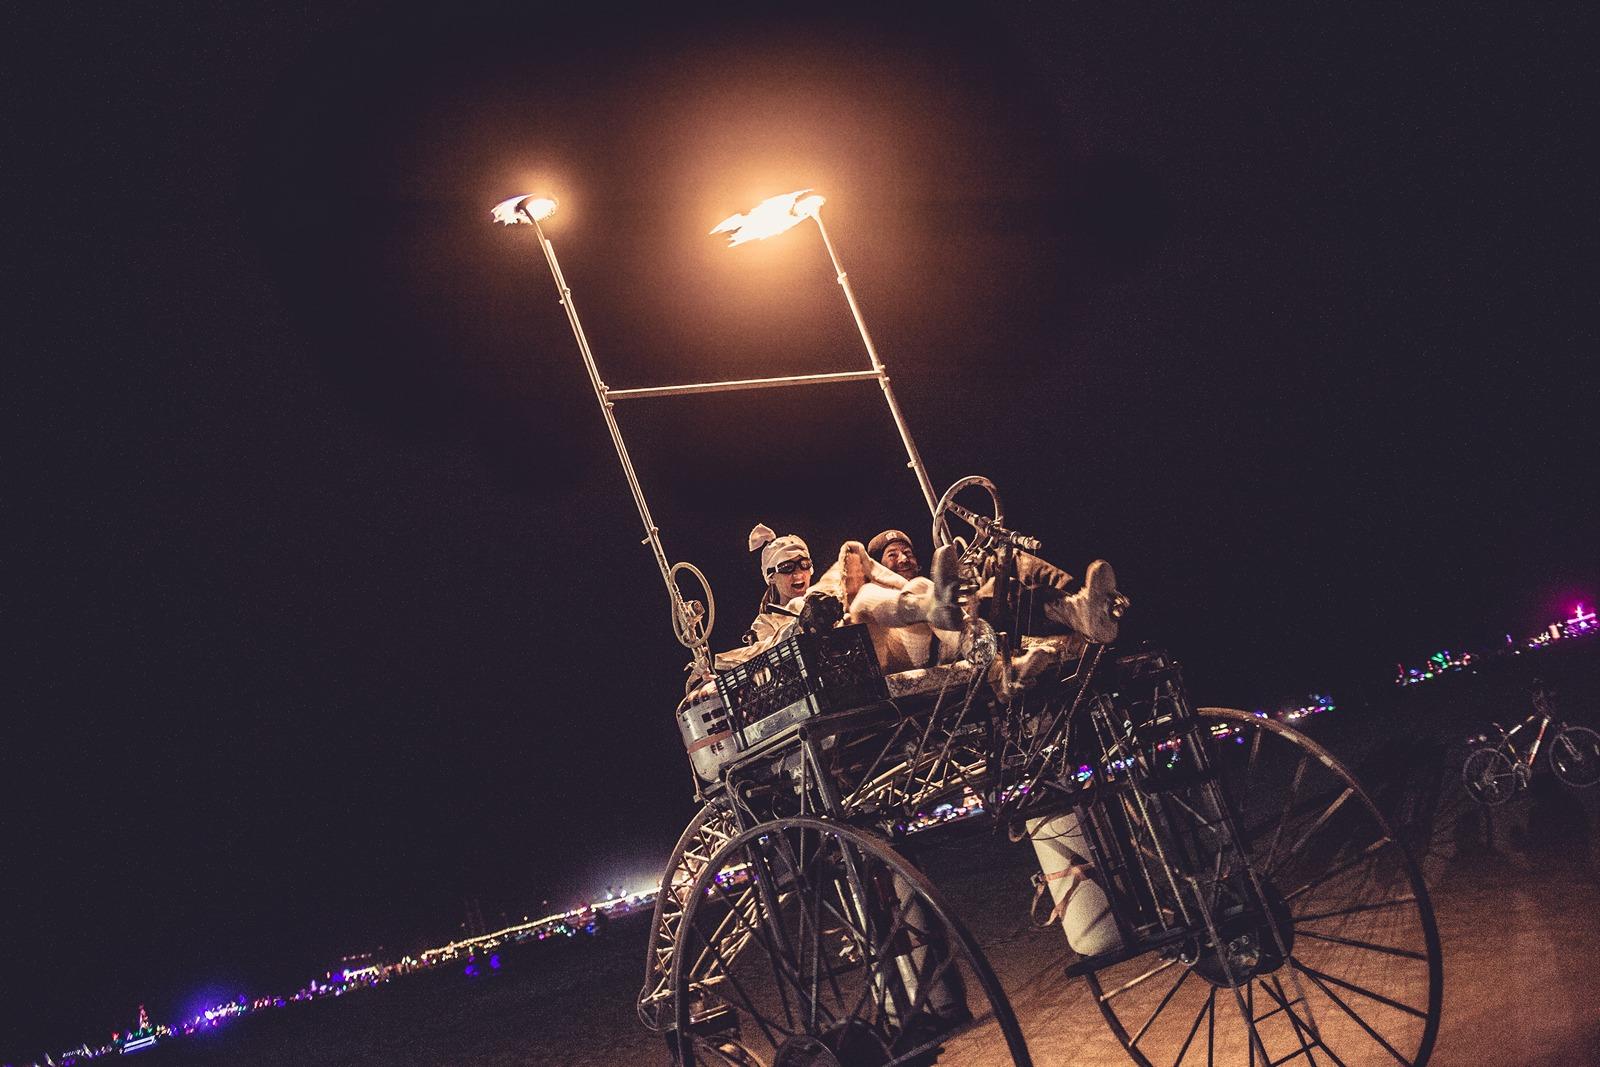 Burning Man - Great vehicule